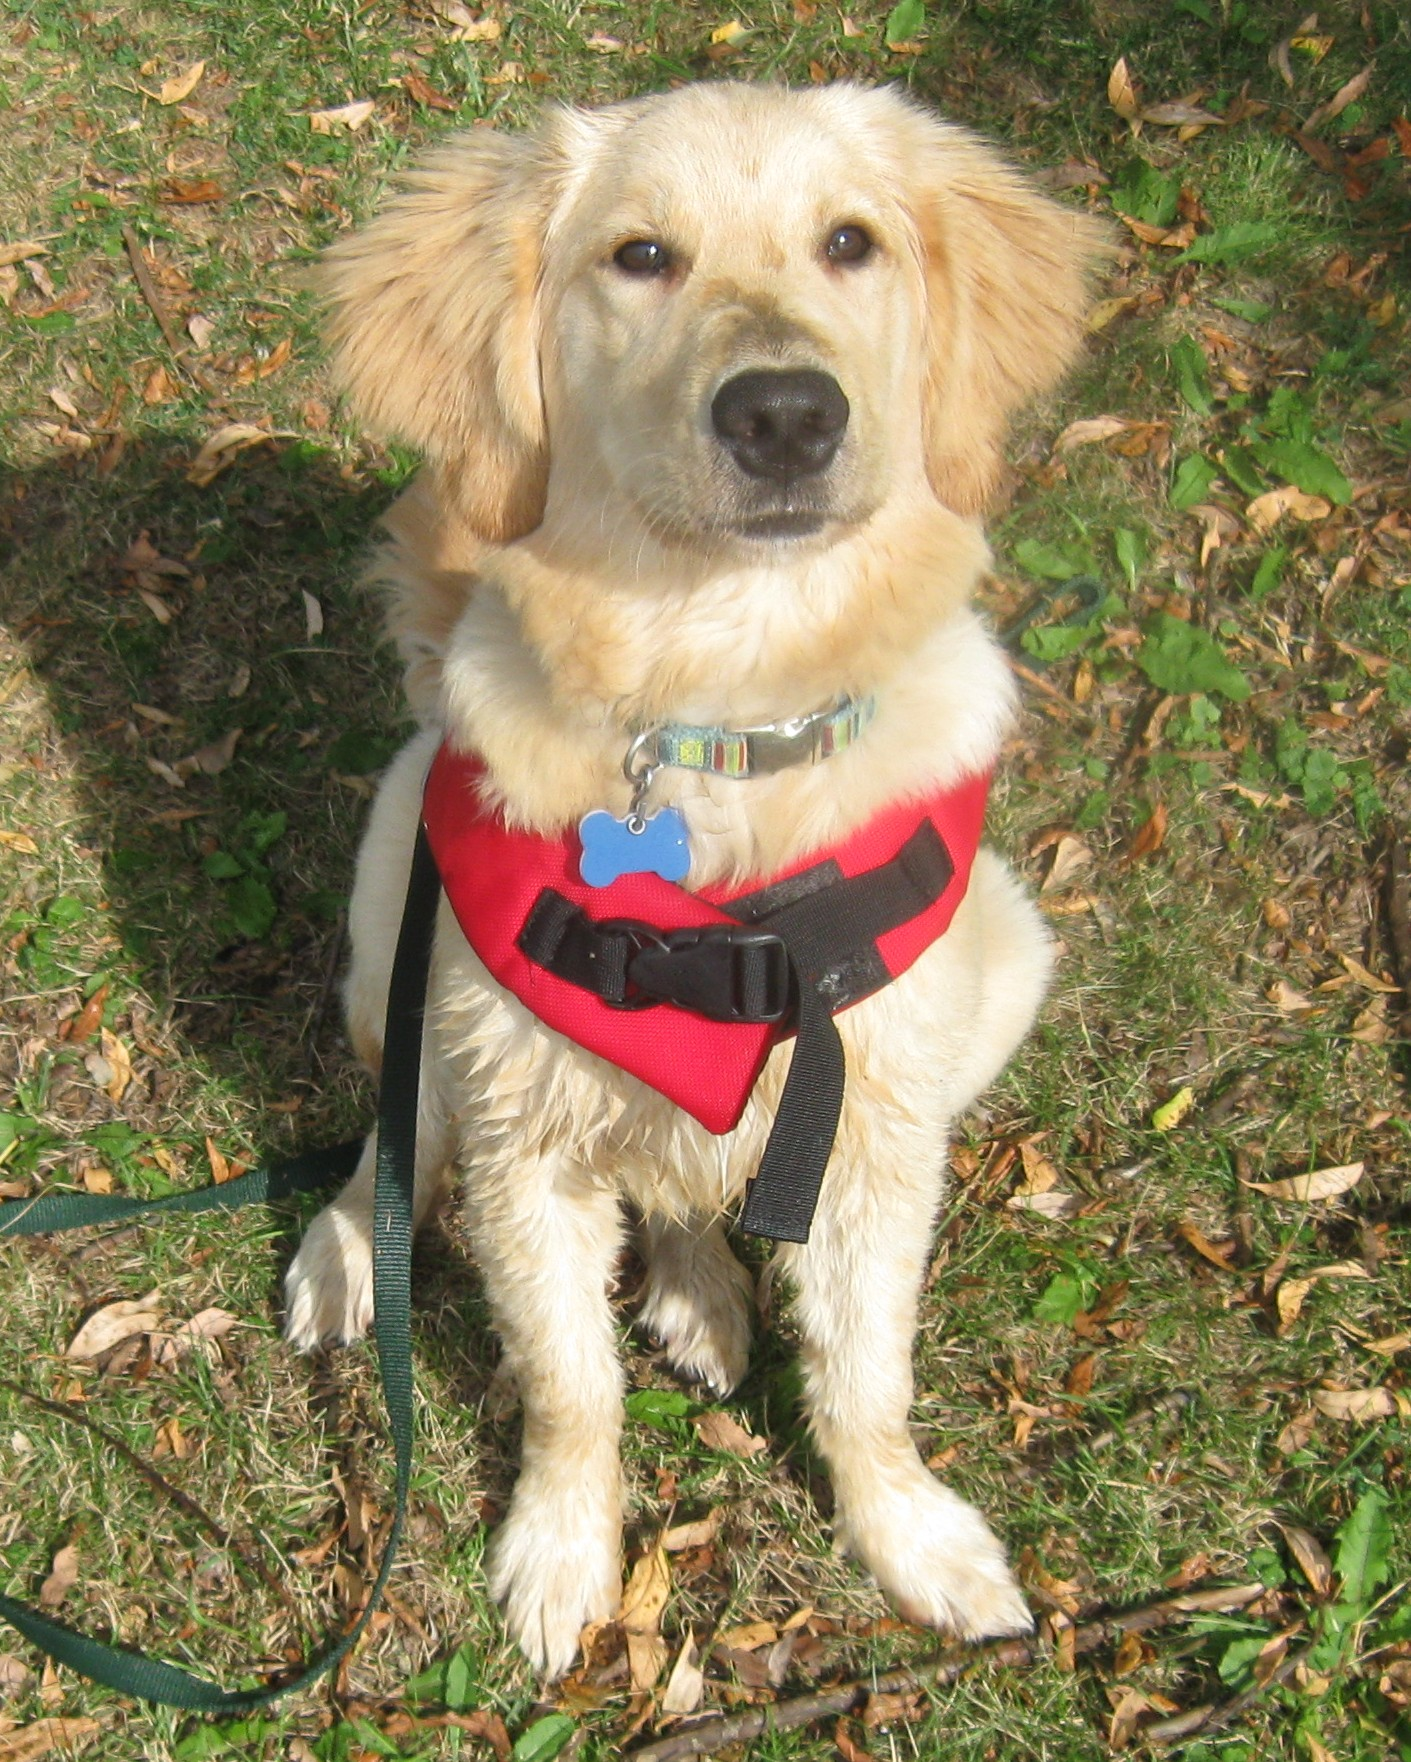 10 Reasons Your Dog Needs A Life Jacket